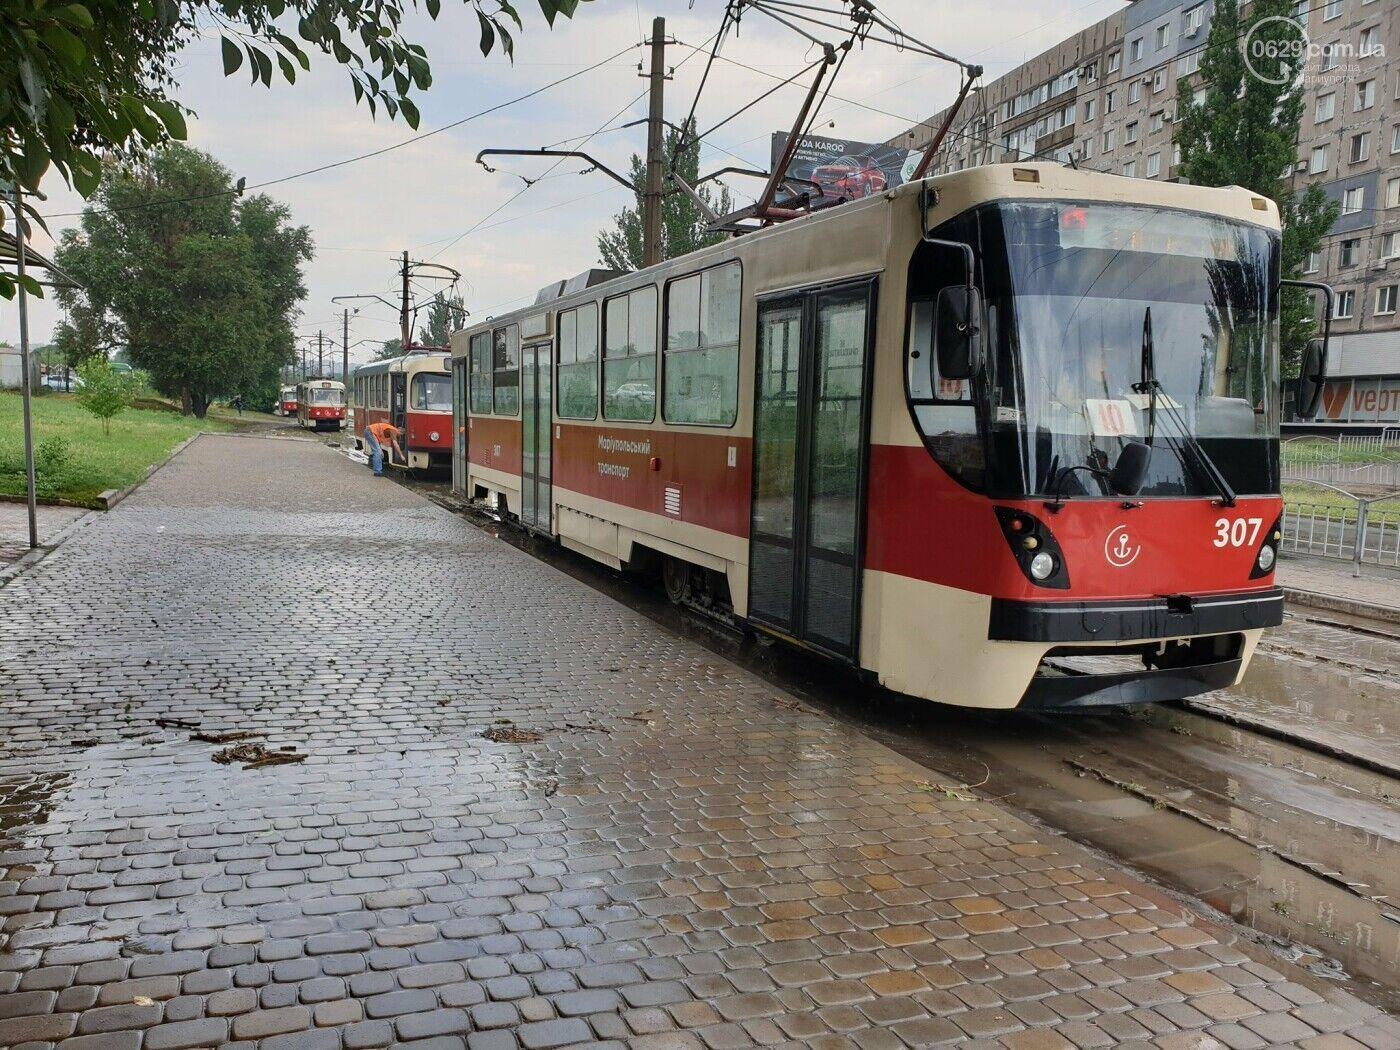 Из-за заиления пути остановились трамваи